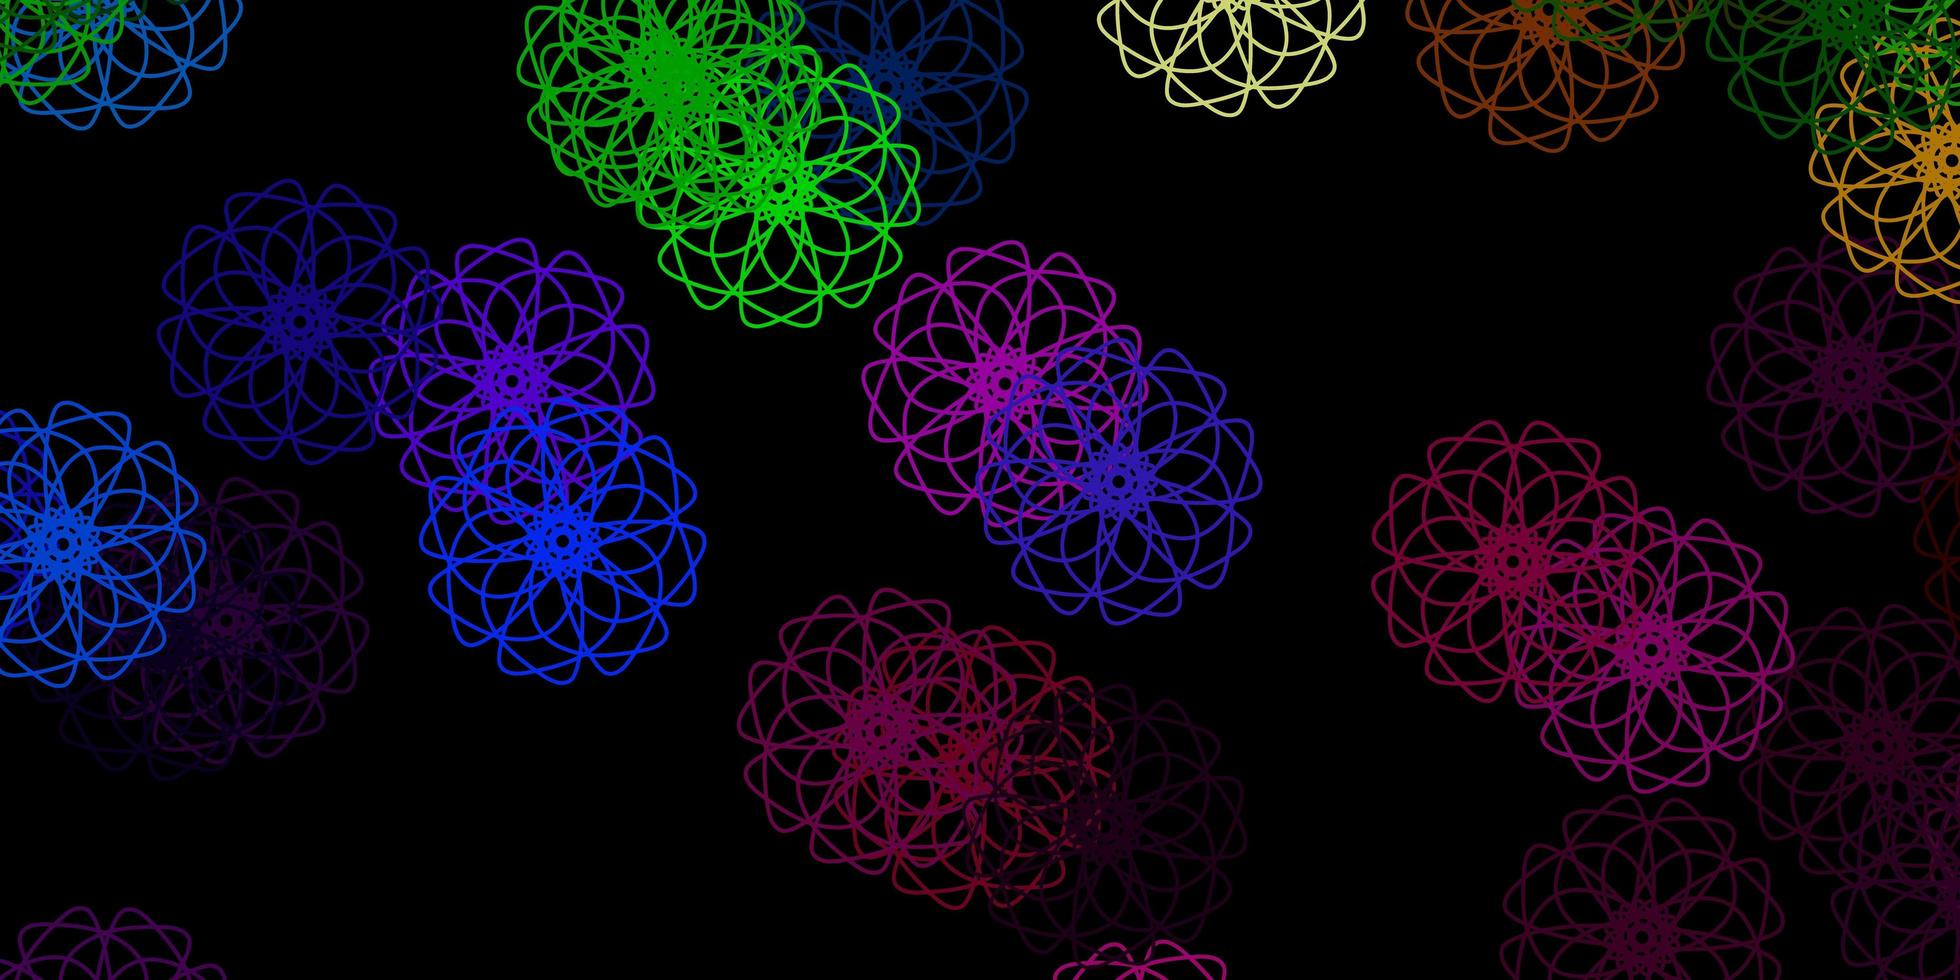 textura de vector multicolor oscuro con formas de memphis.